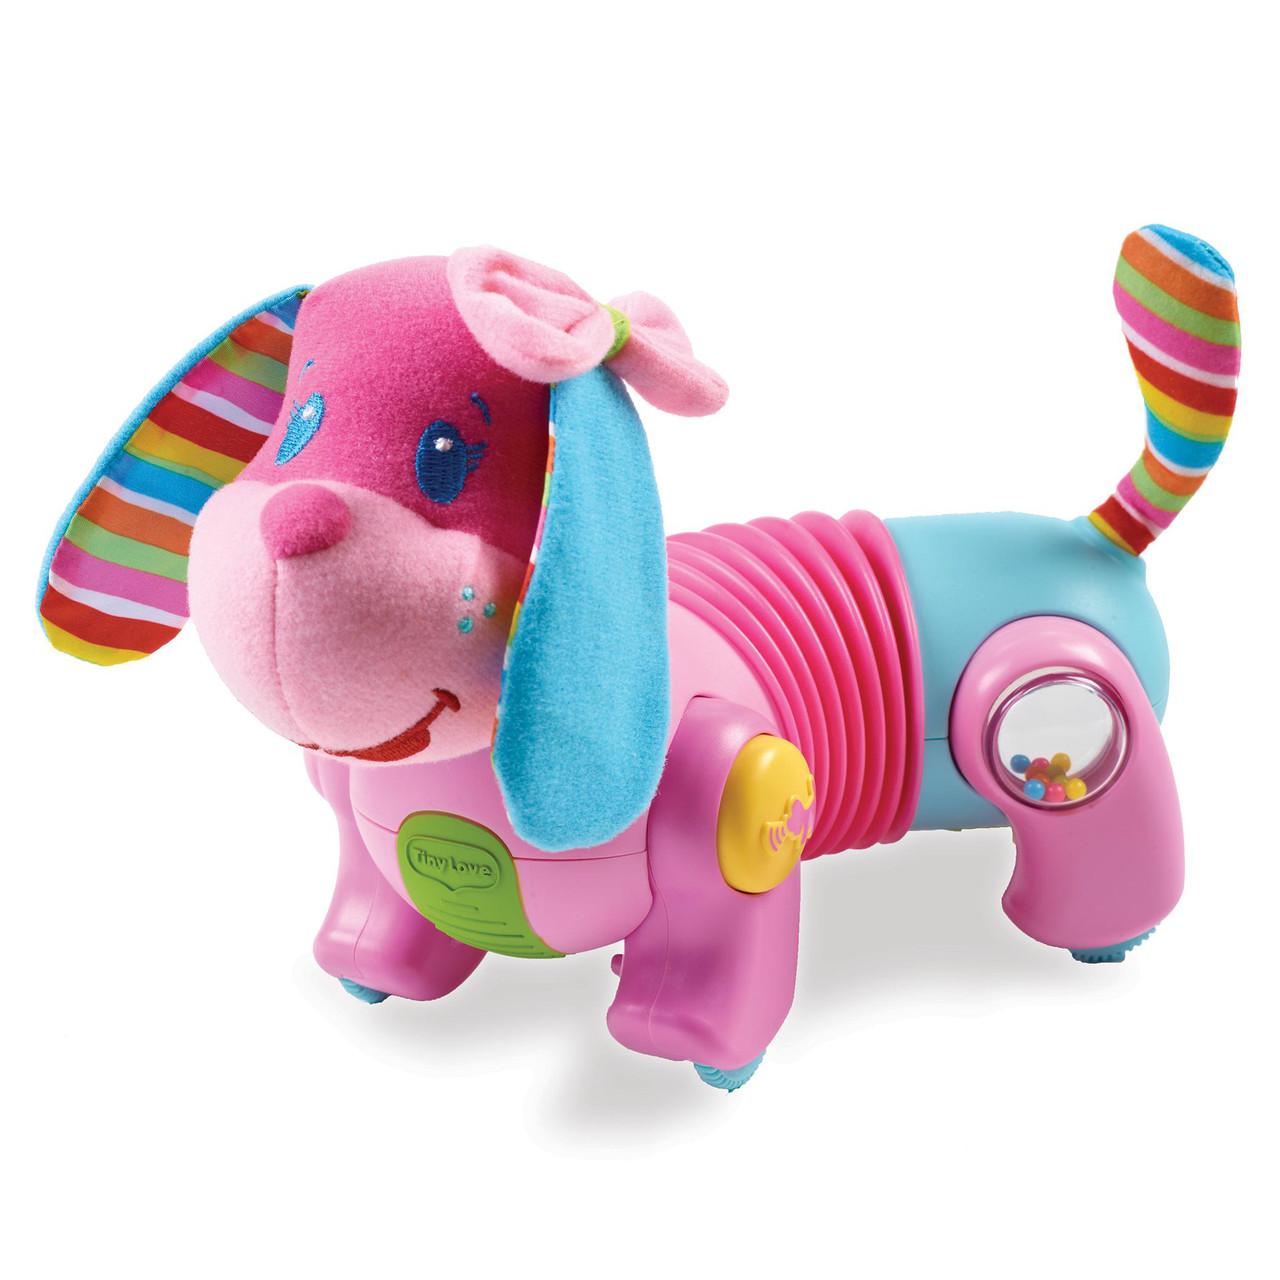 Интерактивная игрушка «Tiny Love» (1502506830) щенок Фиона